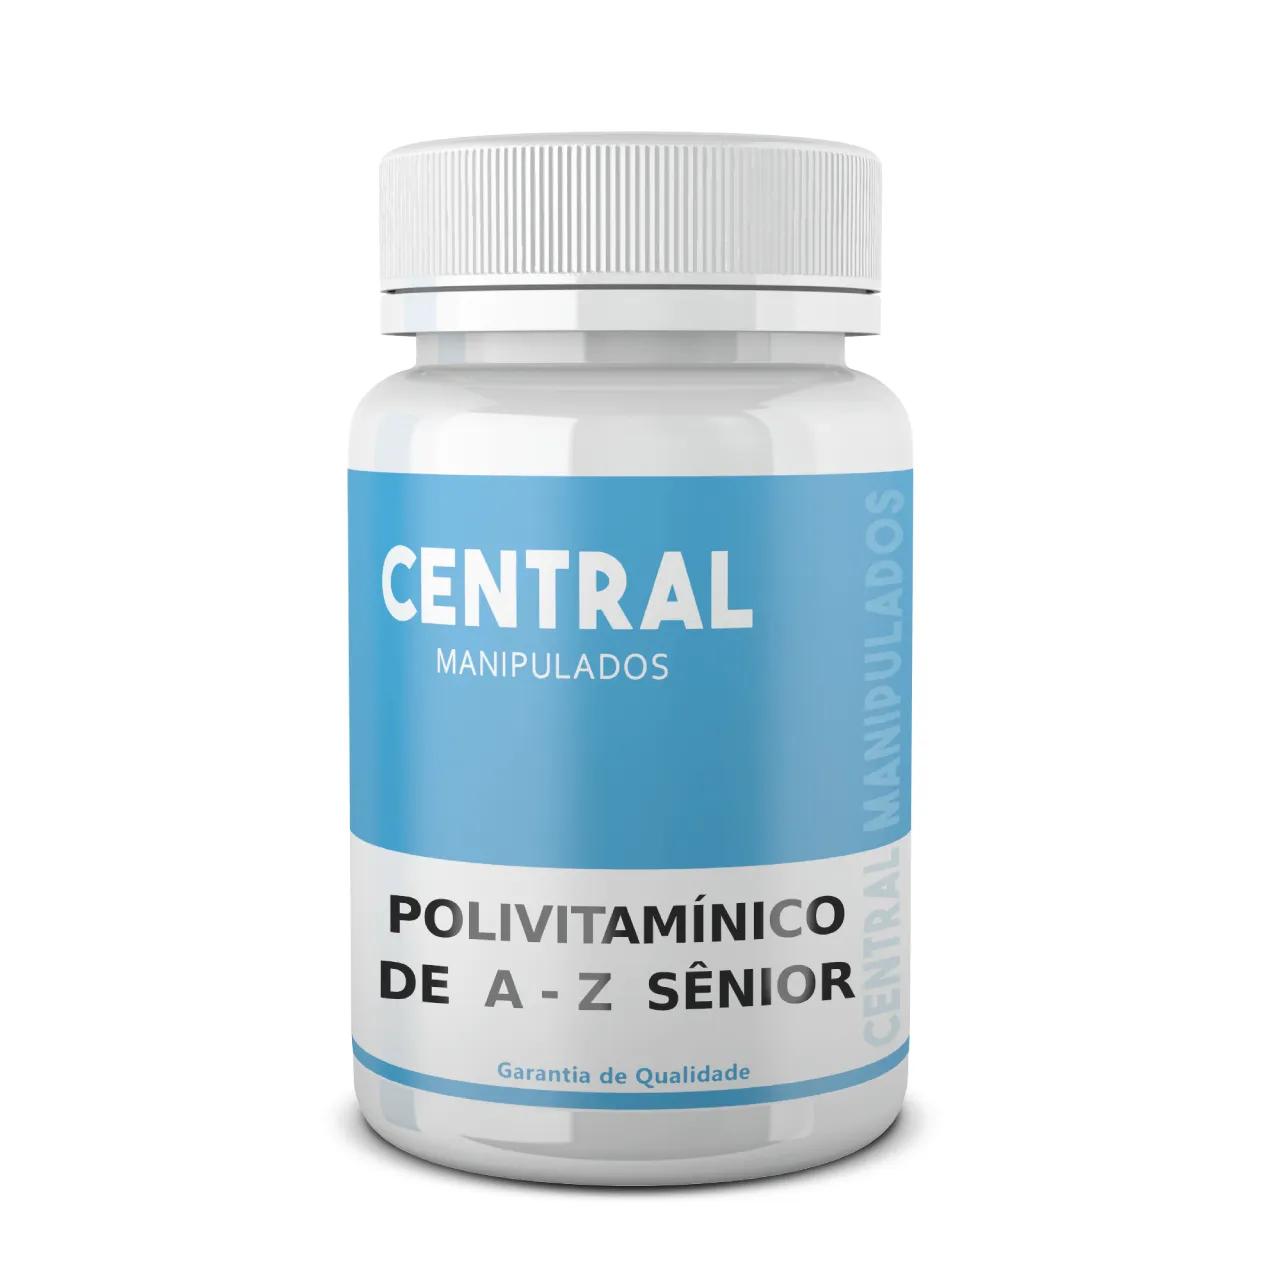 Central Polivitamínico Sênior de  A-Z - 240 cápsulas - complexo vitamínico Central Manipulados